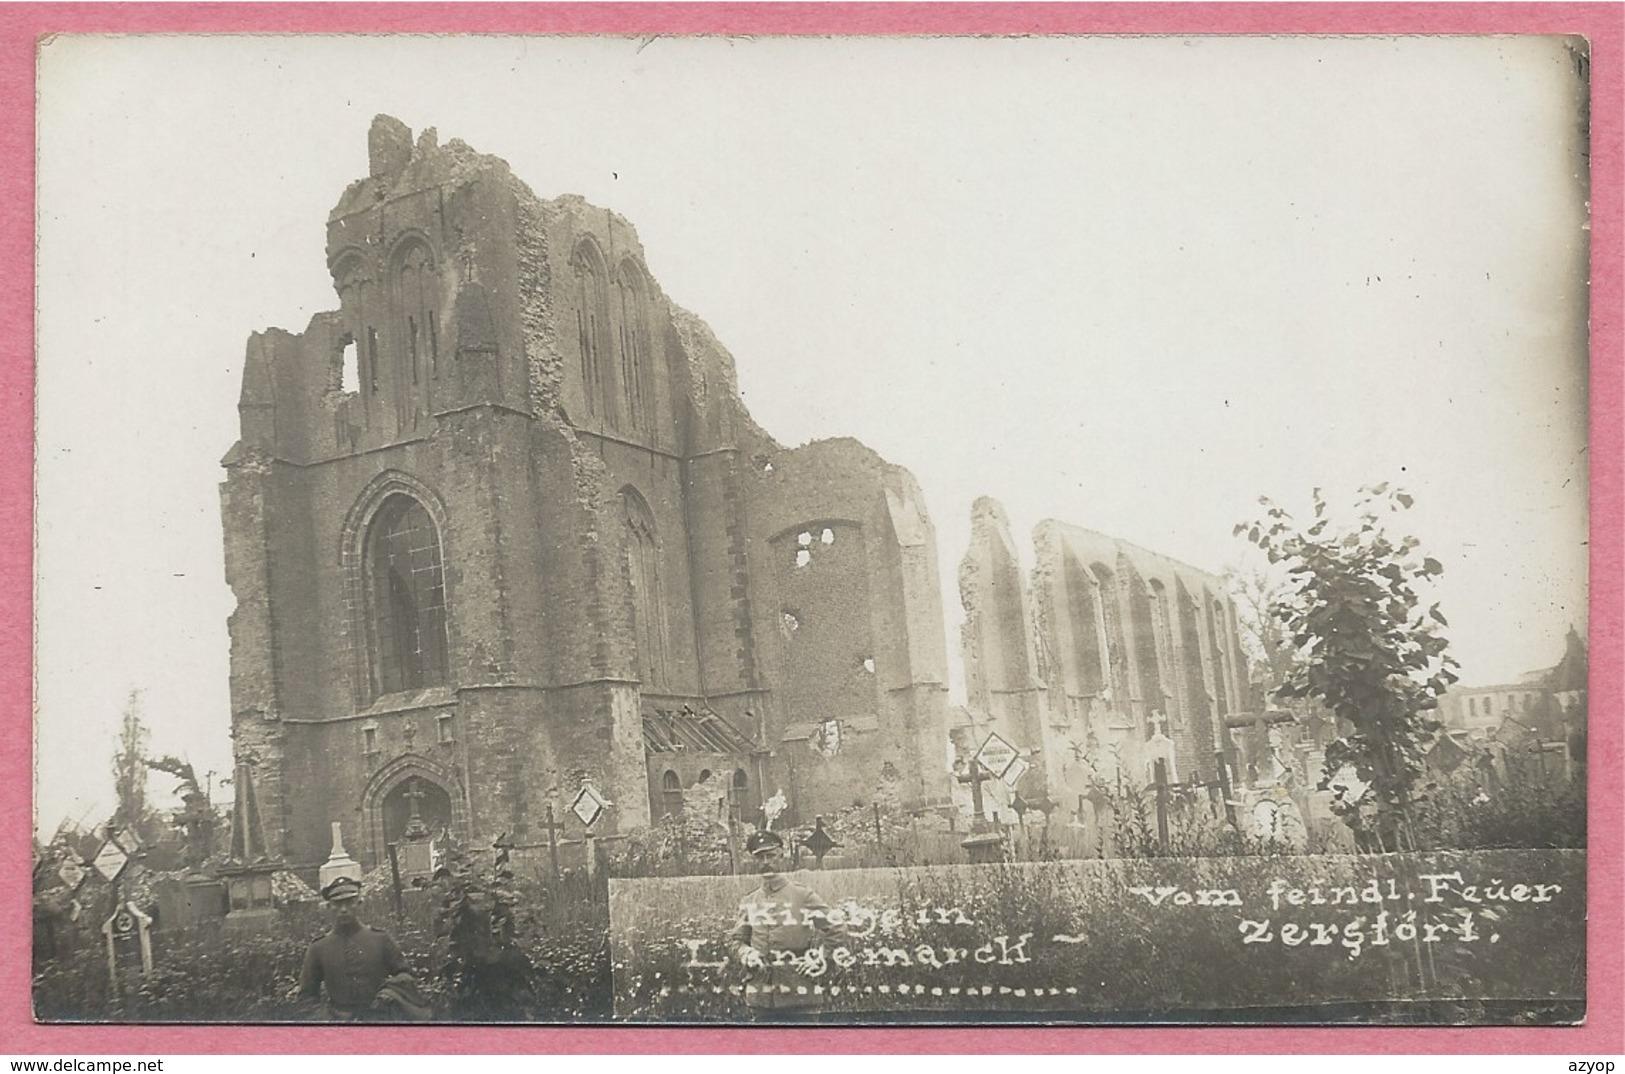 West-Vlaanderen - Flandre Occidentale - Carte Photo - Foto - LANGEMARK - Kirche - Friedhof - Guerre 14/18 - Carte N° 41 - Langemark-Poelkapelle